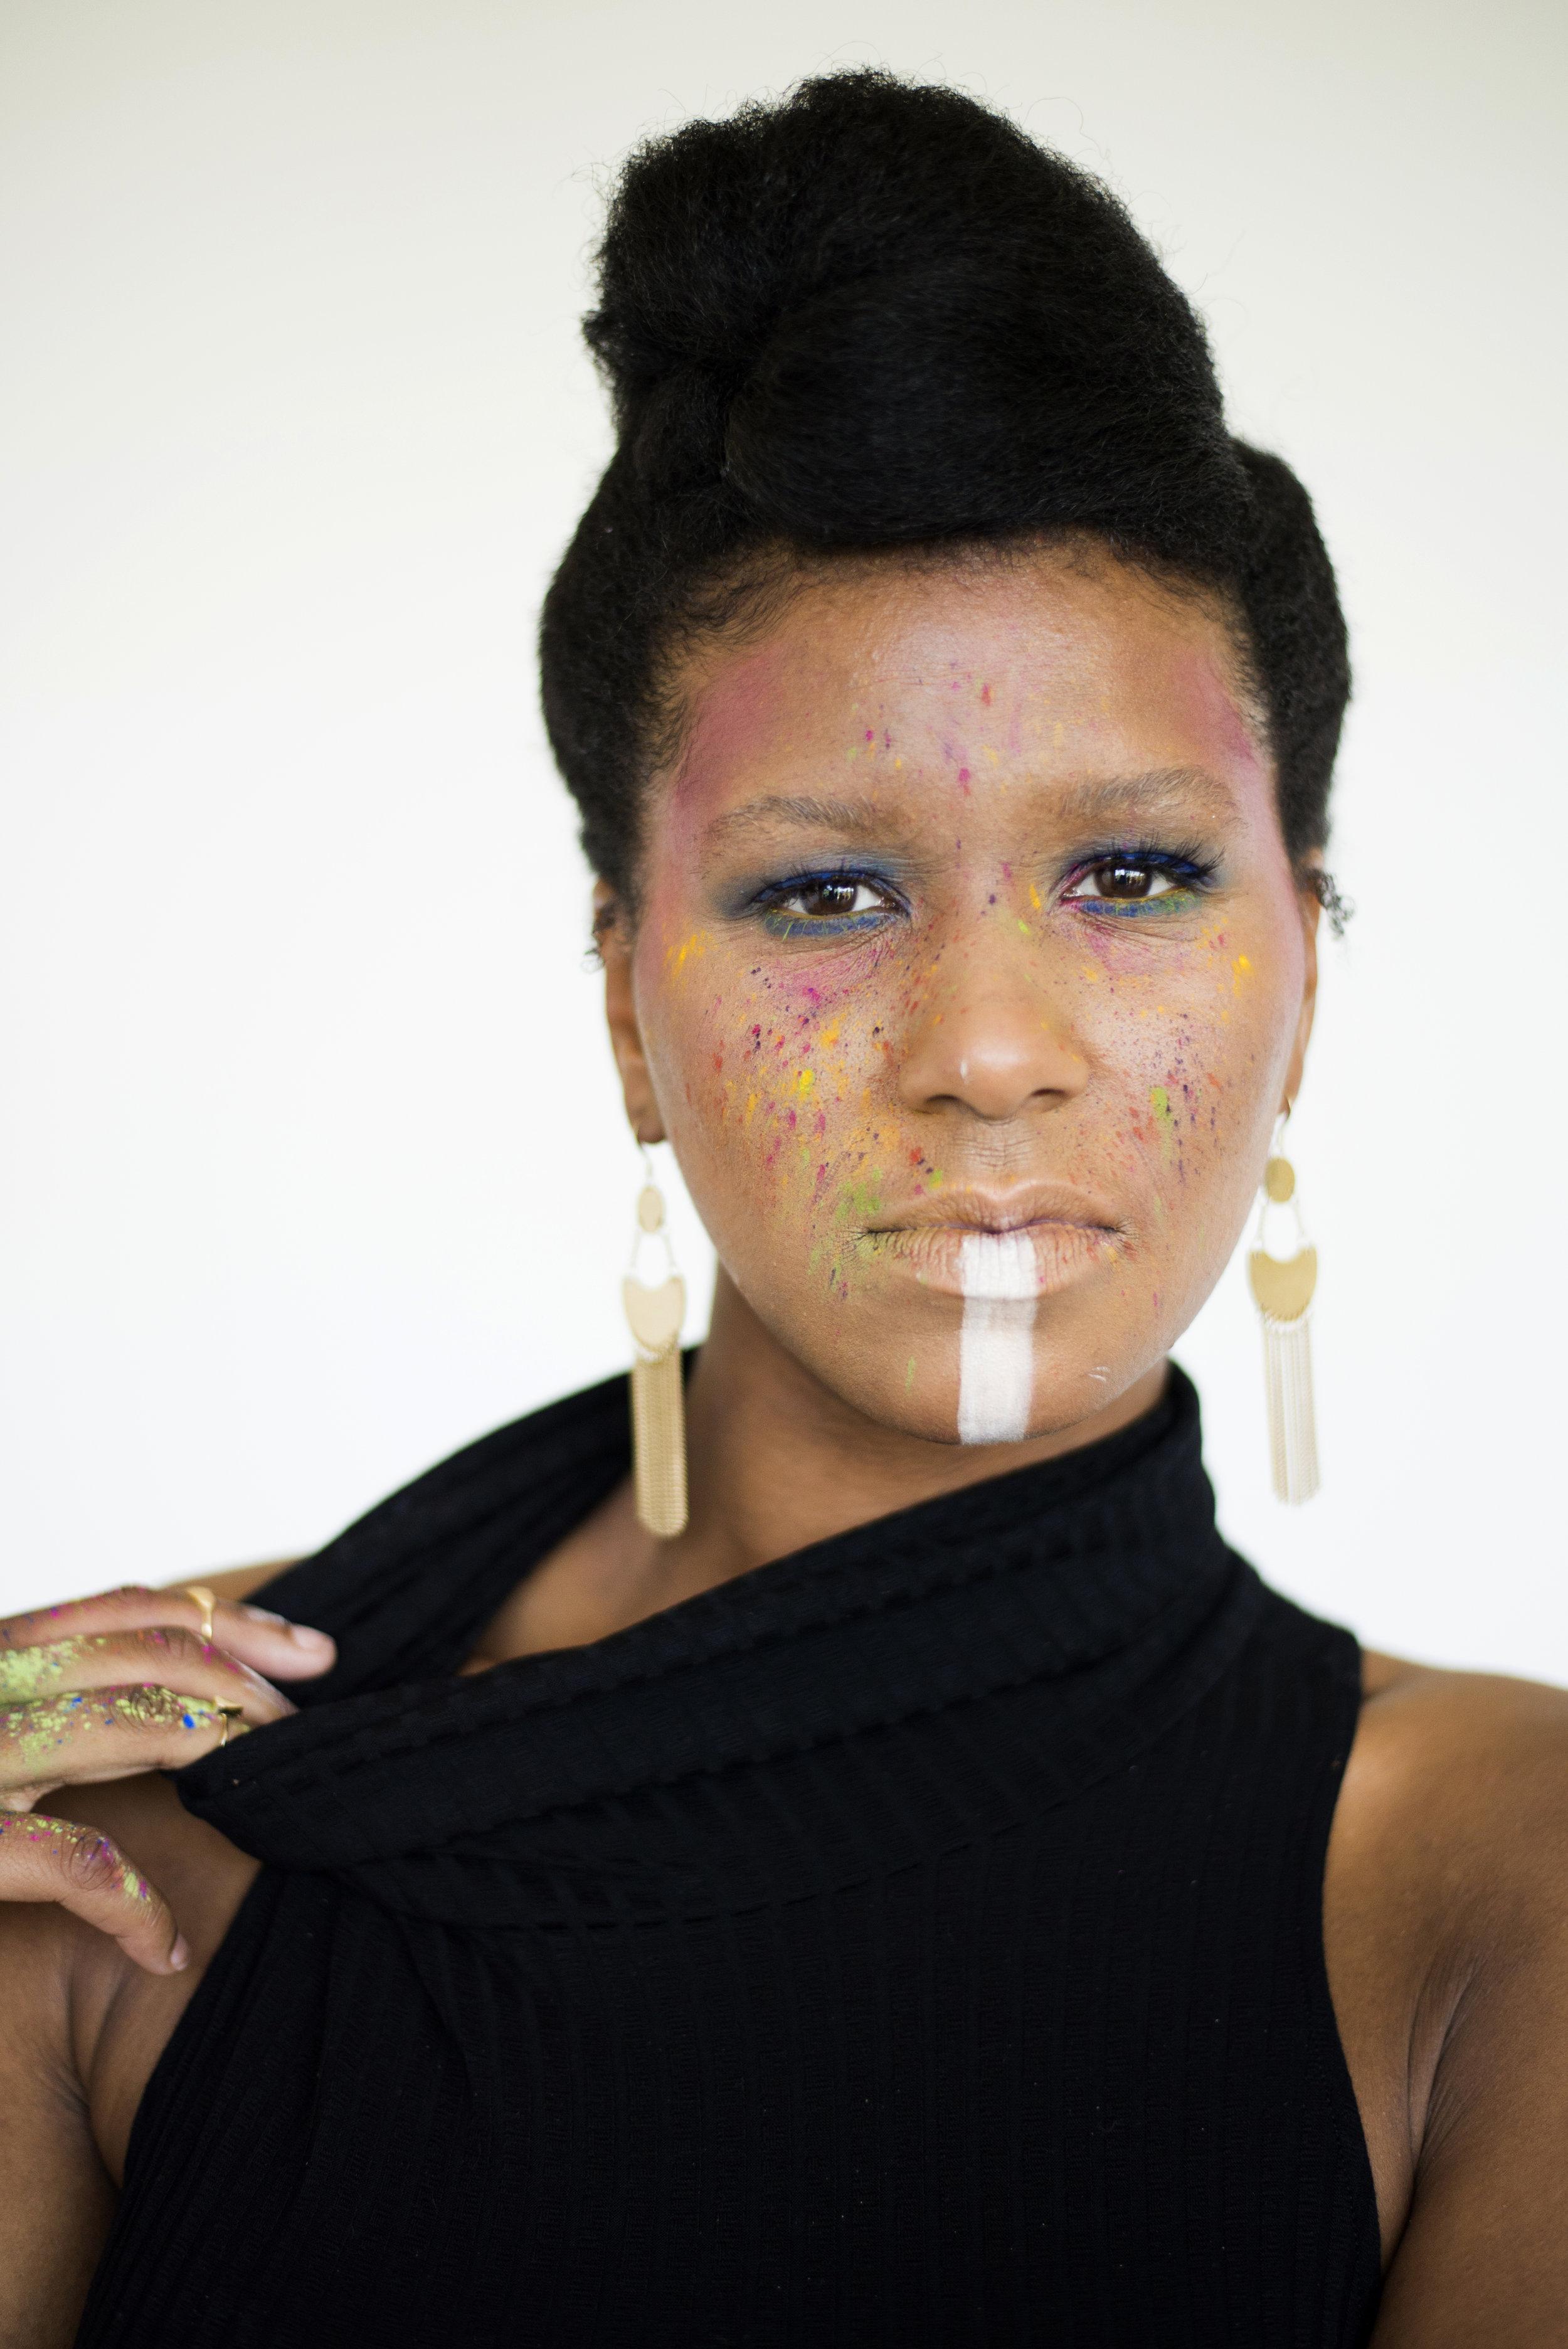 Makeup+Black Clothes_Allie Appel_41.jpg